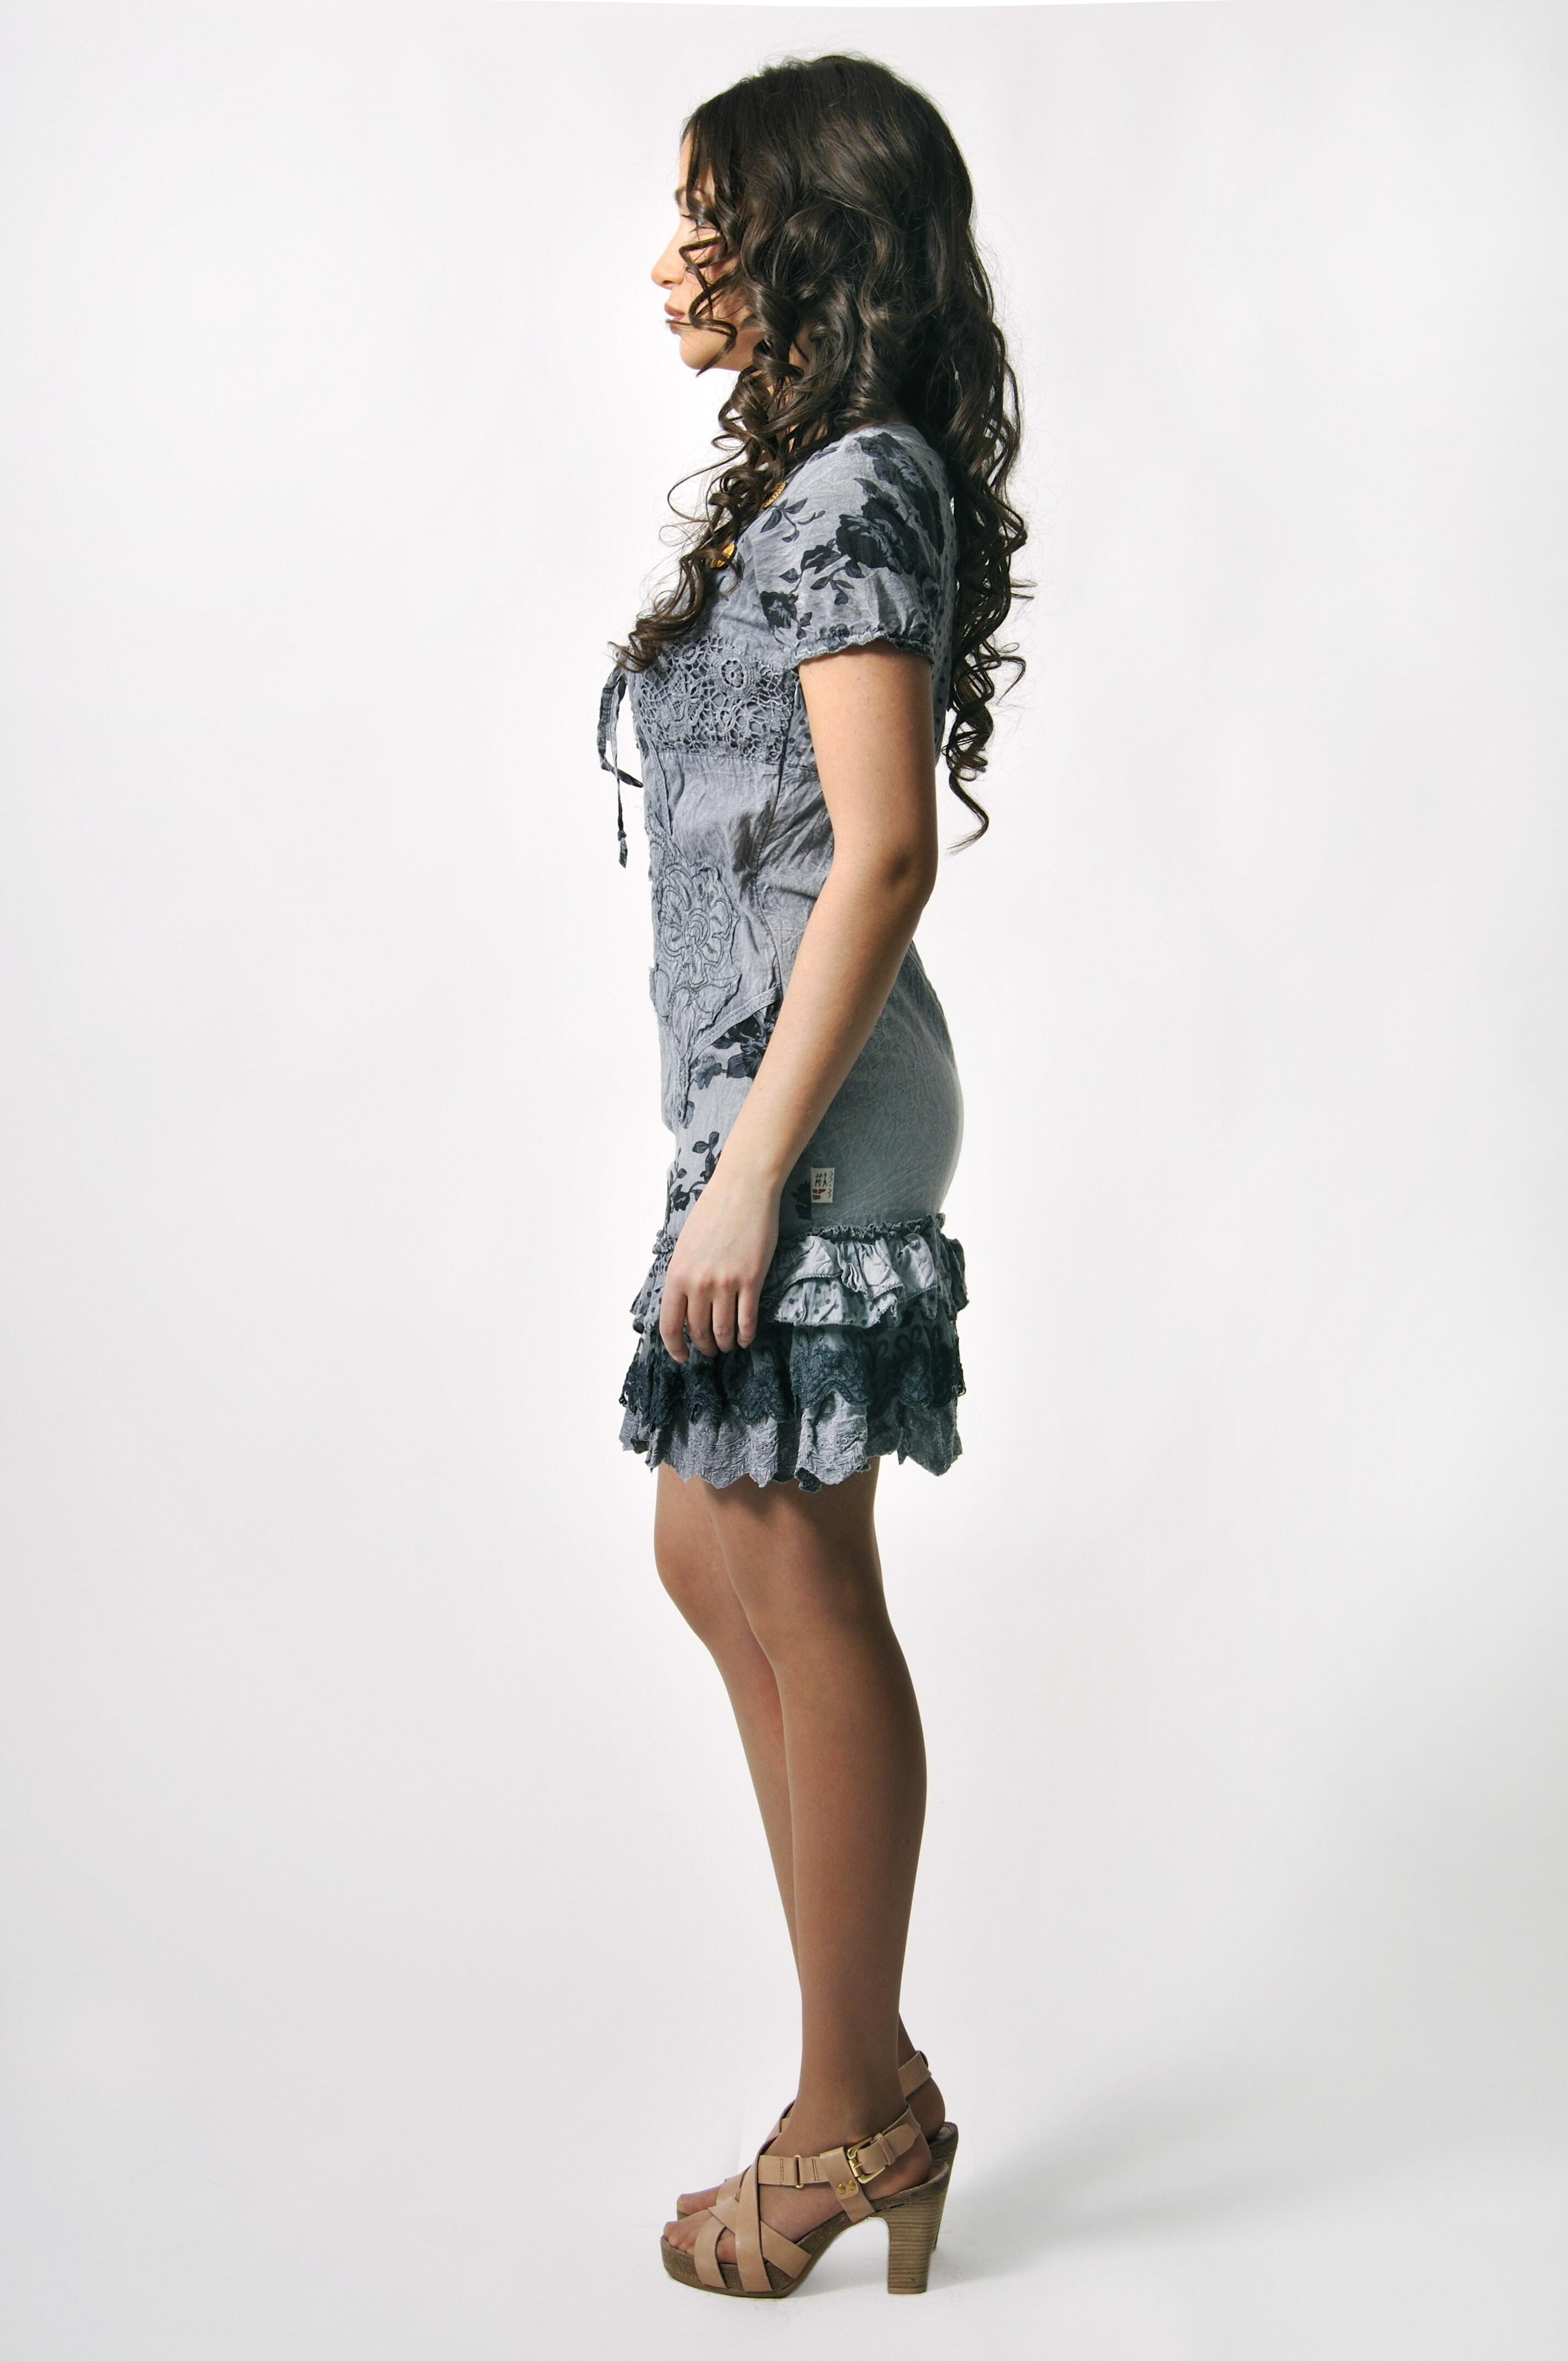 Savage Culture: Taste Me Tiffany Crinkled Cotton Dress (1 Left!)